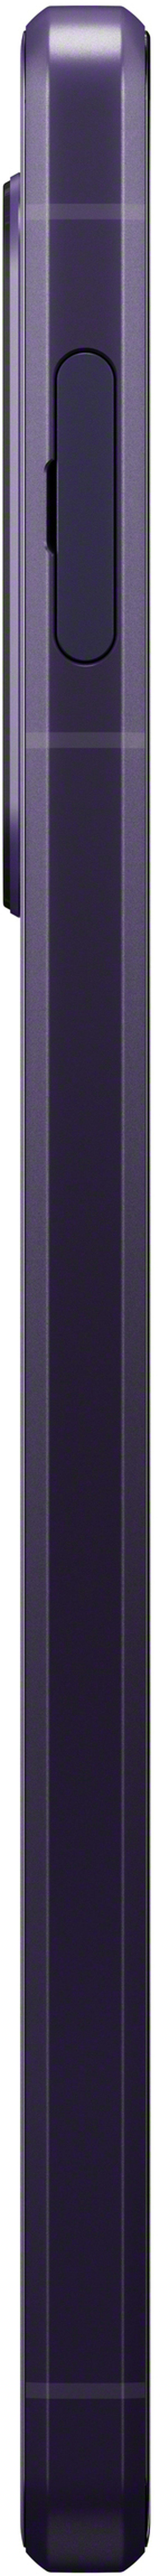 Sony XPERIA 1 III 256GB Dual-SIM Lila